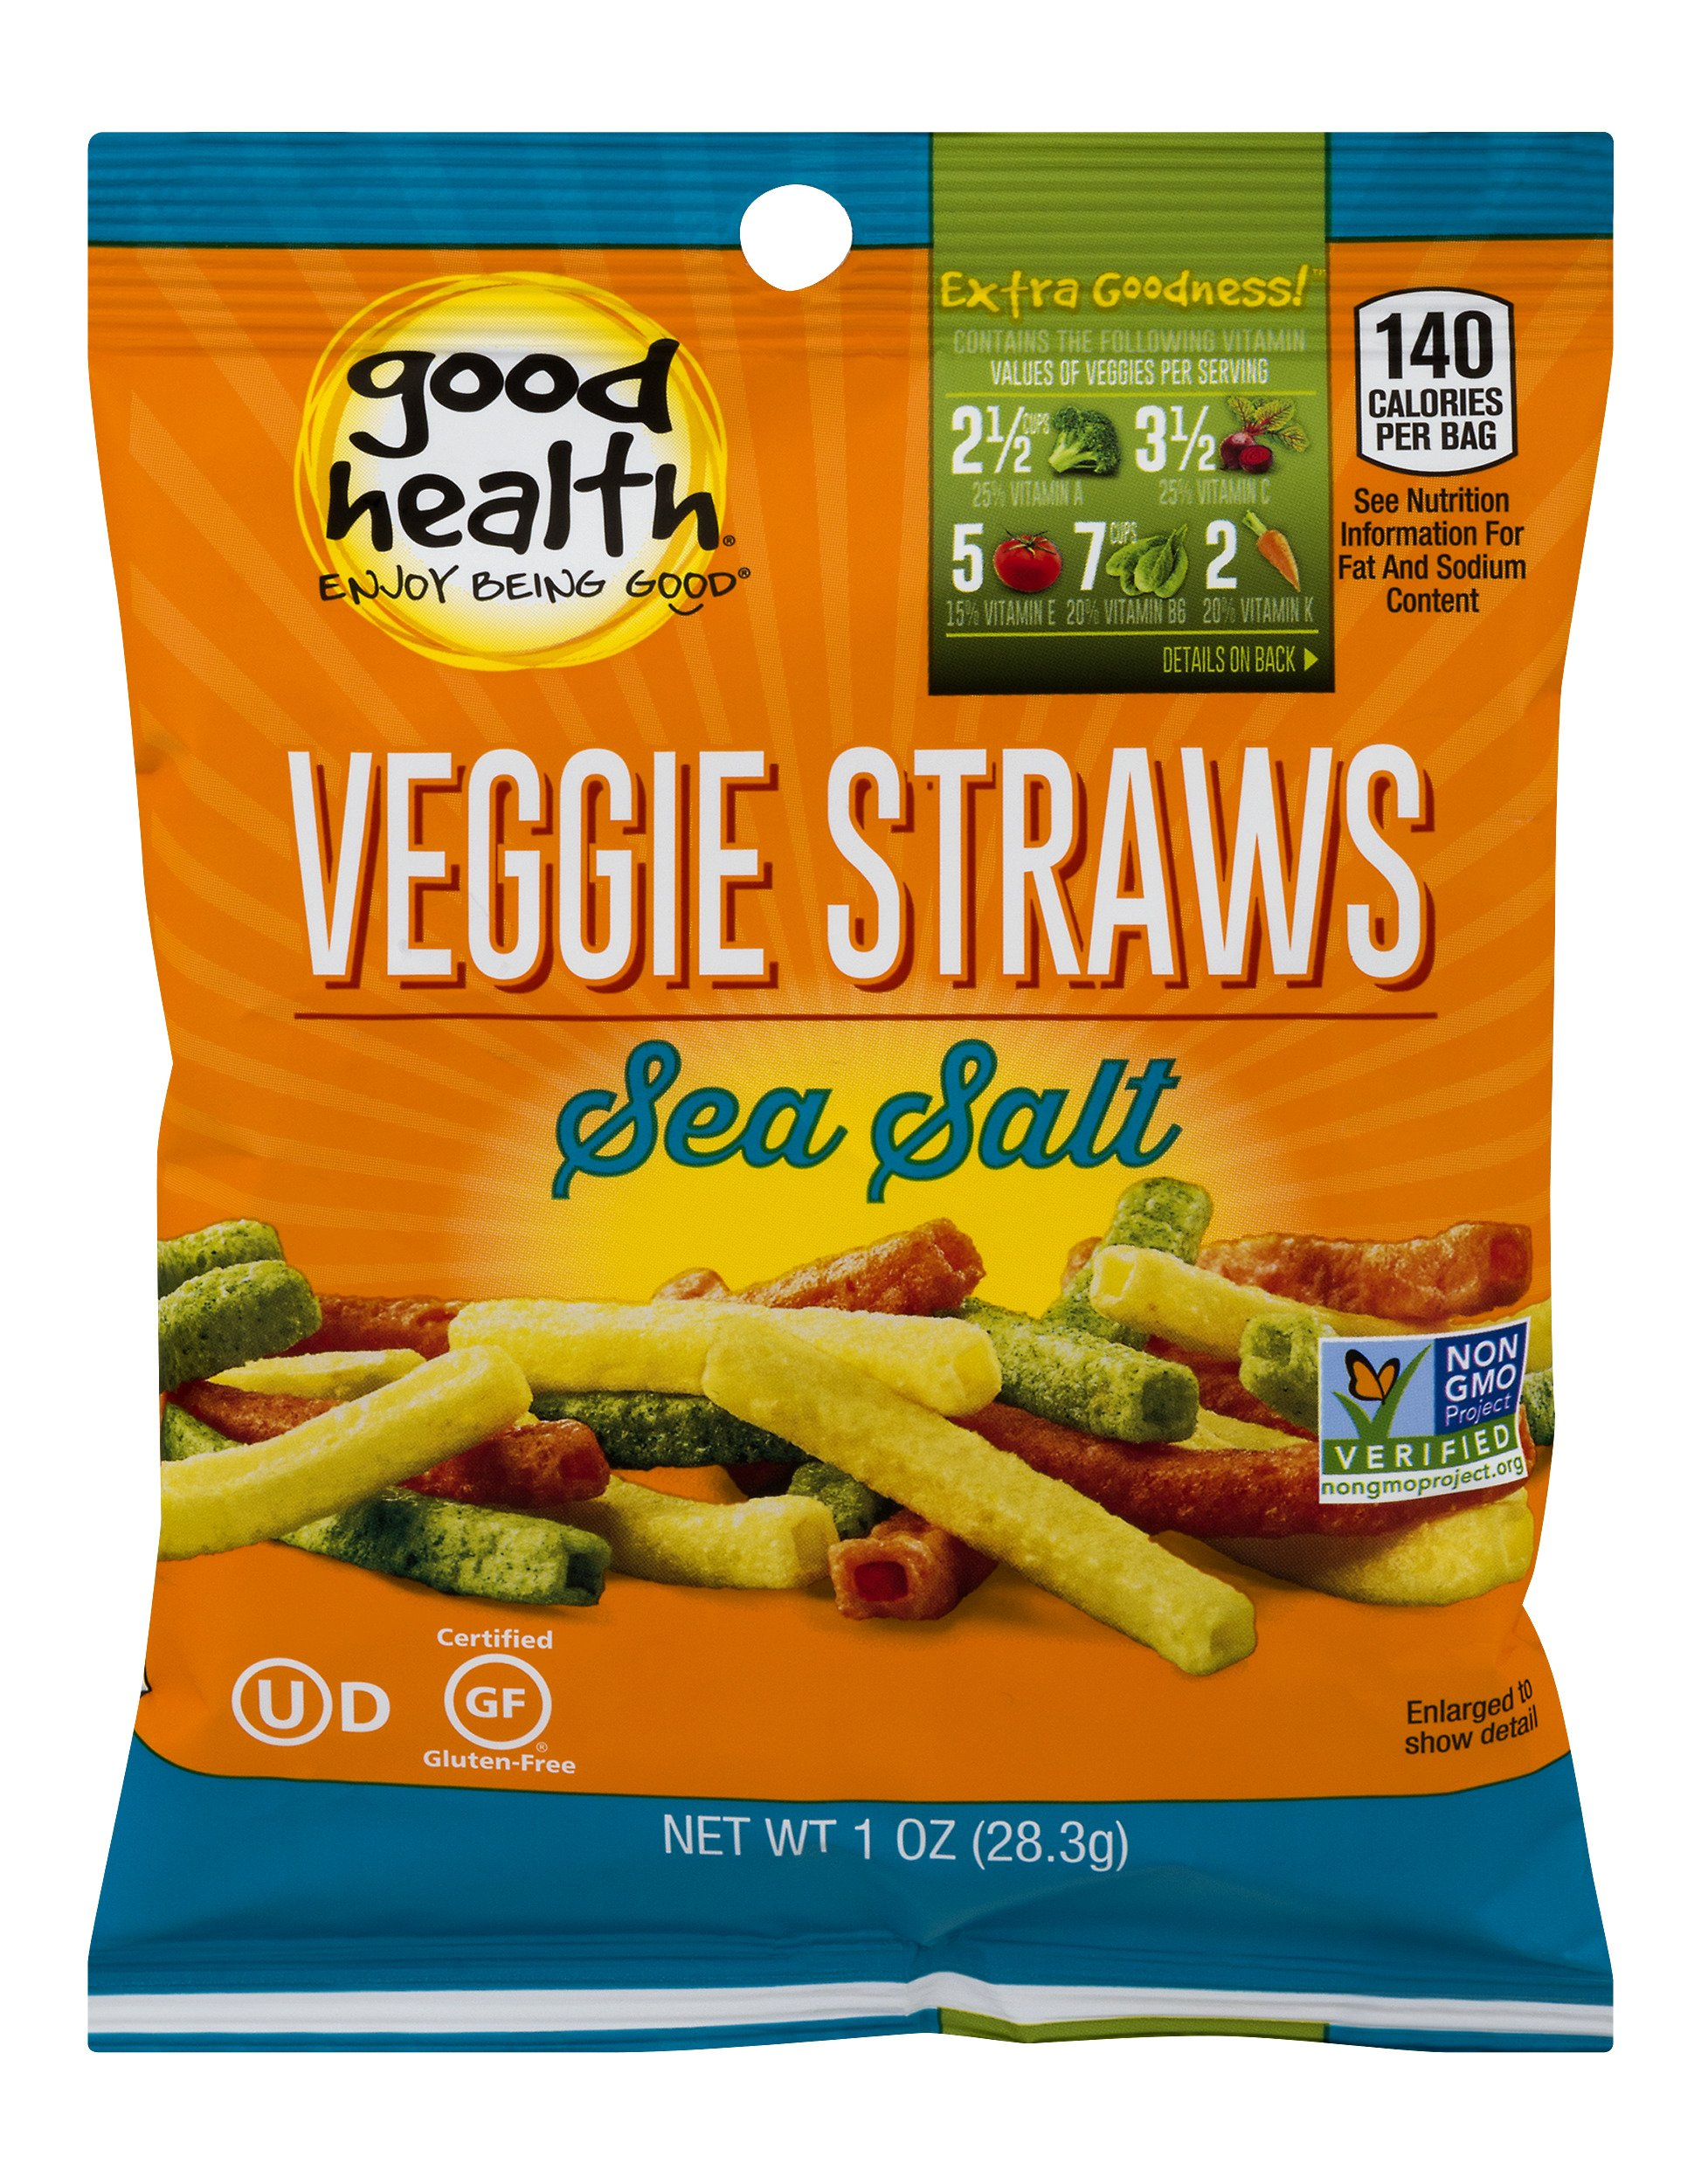 Good Health Veggie Straws Sea Salt, 1 oz by Goodhealth